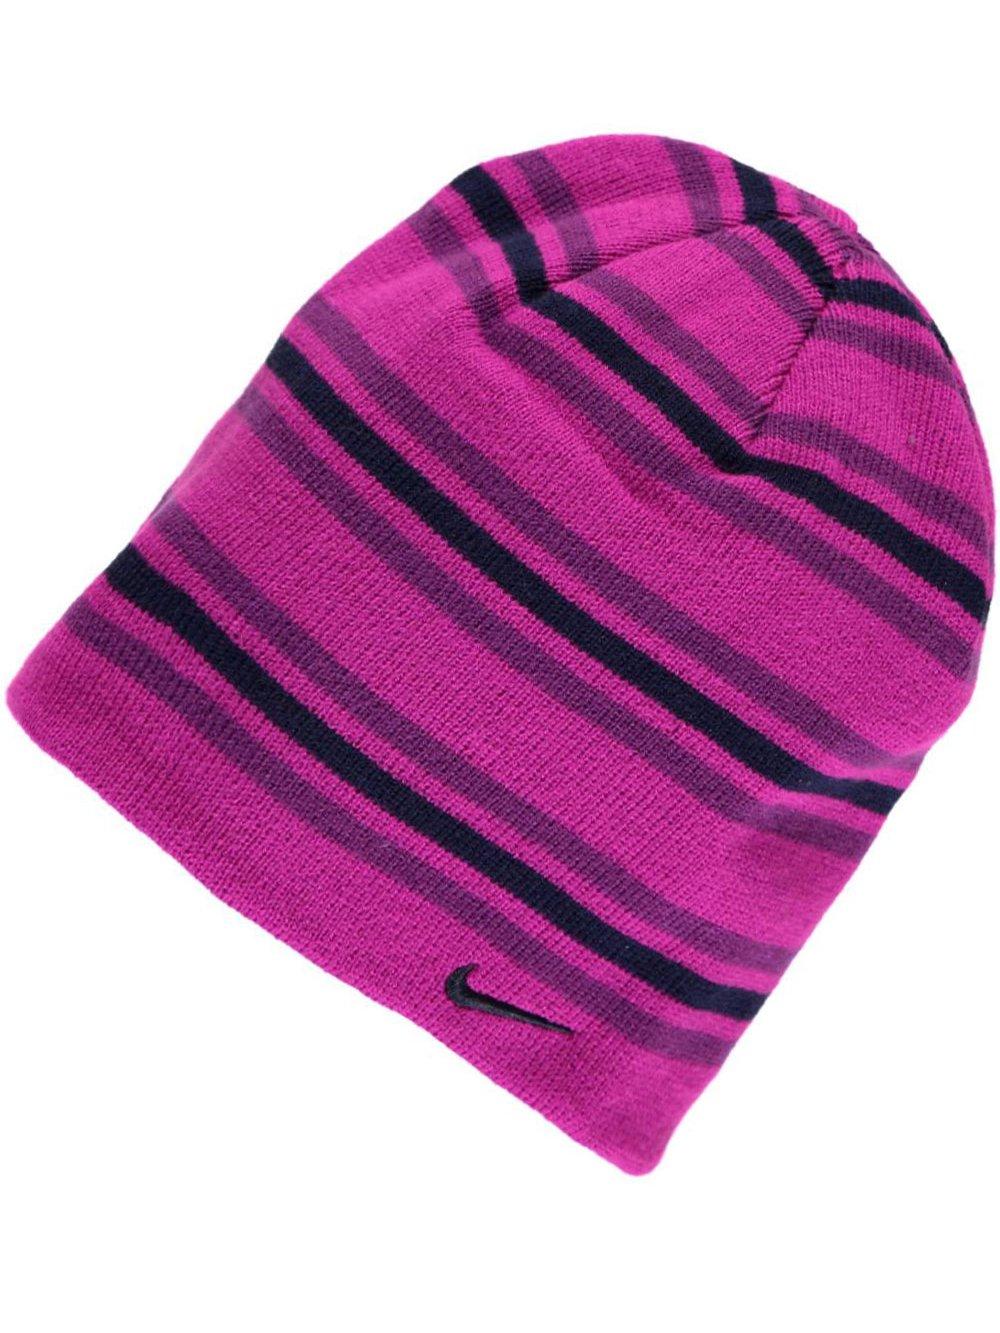 Nike Knit Beanie (Big Girls' One Size) - vivid grape, 7 - 16